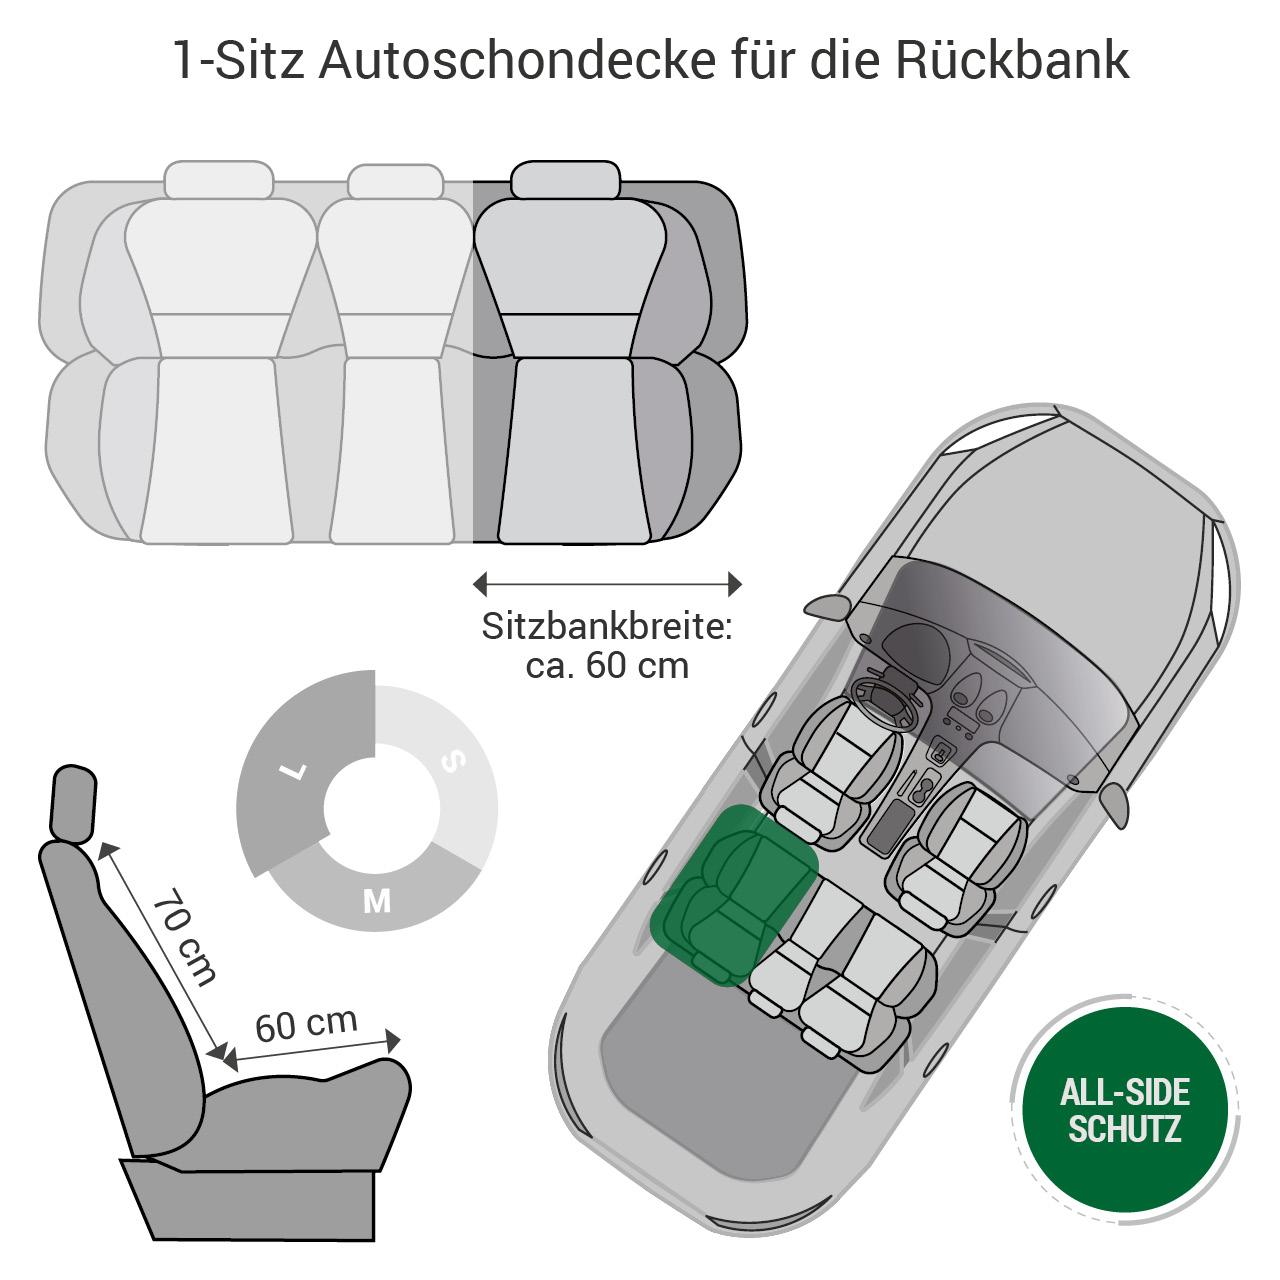 Doctor Bark - Autoschondecke für Hunde - Rückbank 1-Sitz Gr. L - grau